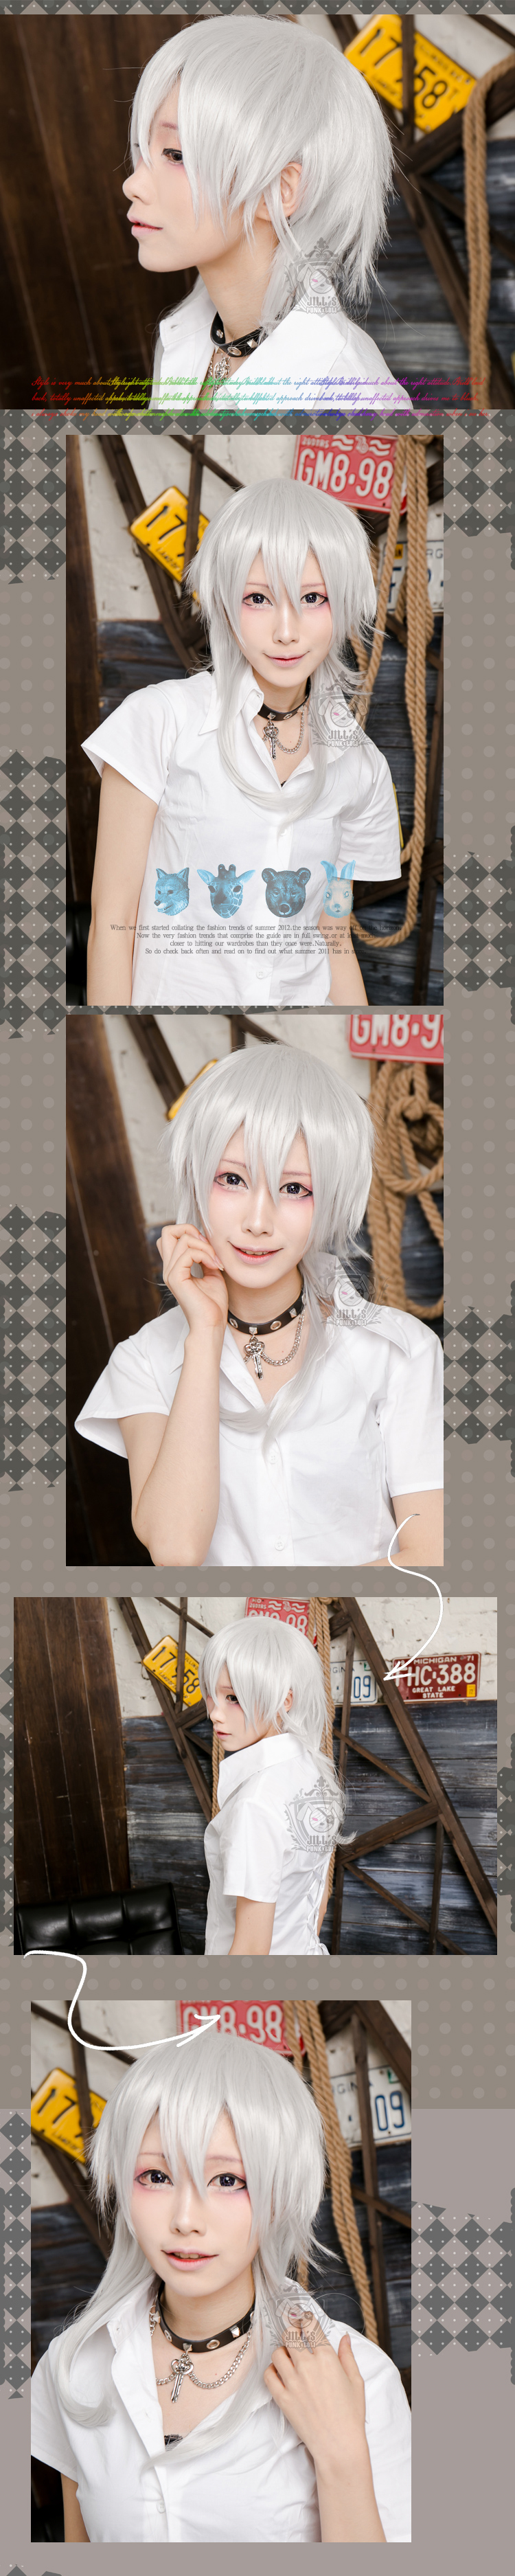 japan anime cosplay Touken Ranbu Mikazuki Munechika asymmetrical wig JPLH059